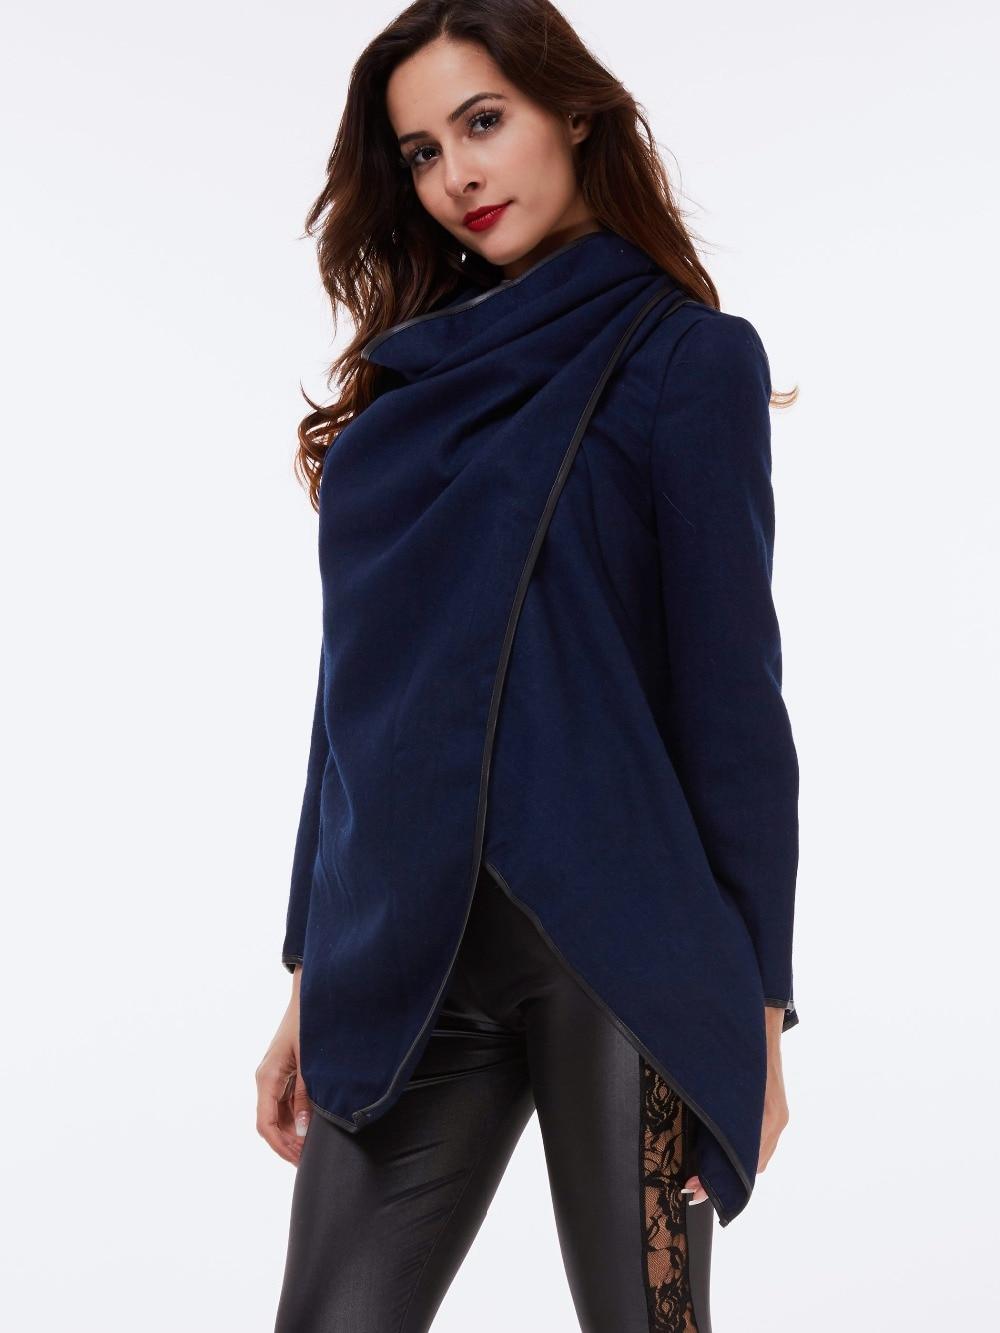 Fashion Street Black Vintage Coat Warm gray Wrap Solid Ladies navy Office Autumn Blue Overcoat Casual Winter Outerwear Trench Women Black Slim Gray qx8IwEAqt